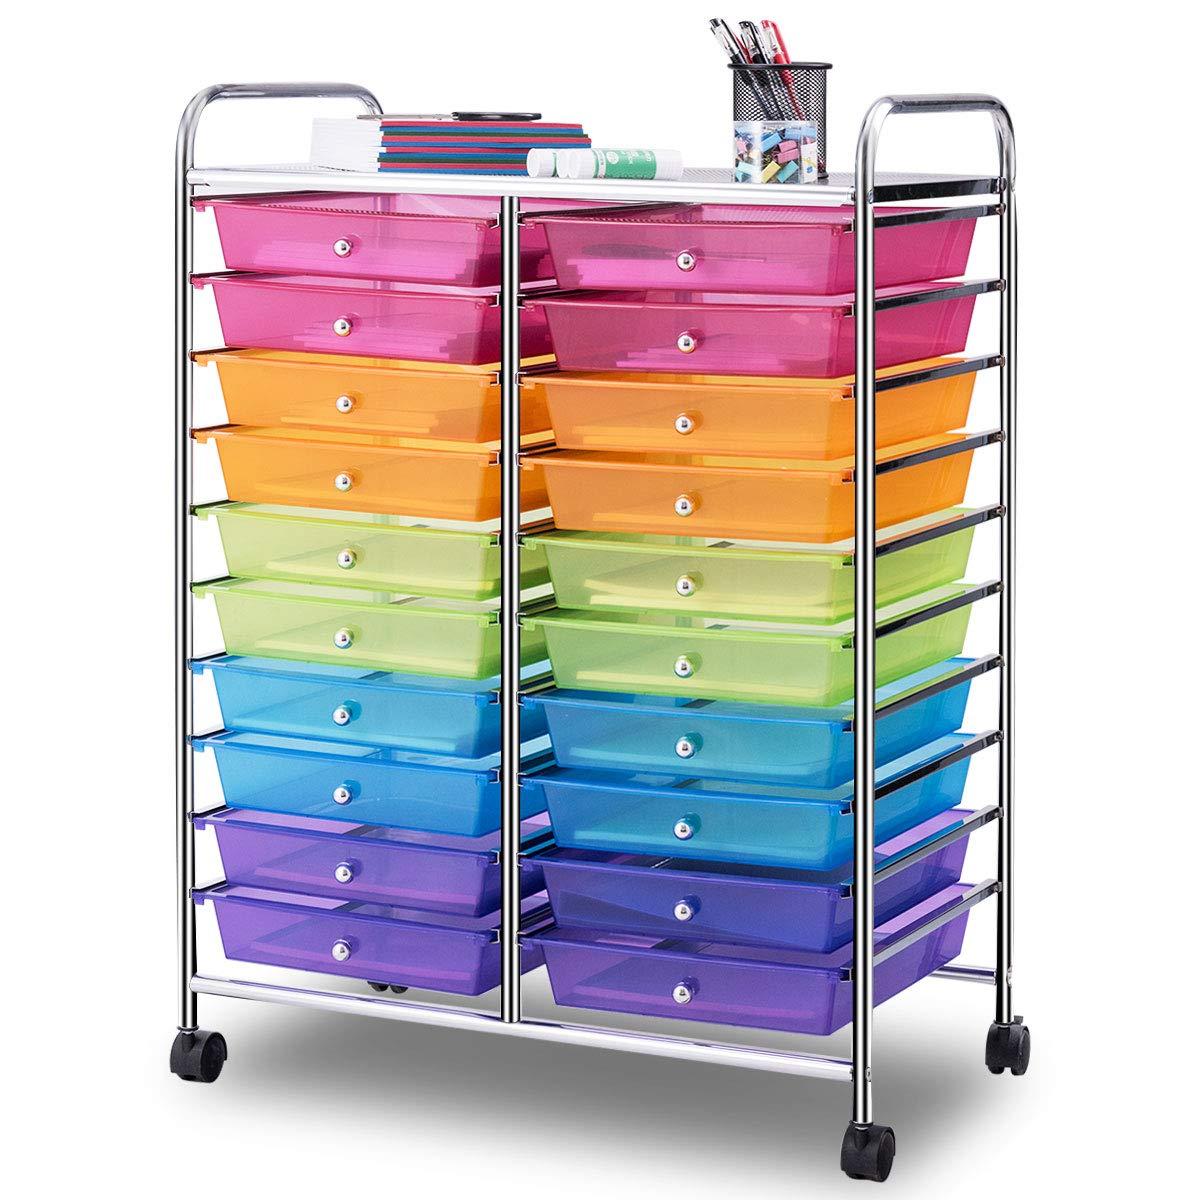 Giantex 20 Drawer Rolling Storage Cart Tools Scrapbook Paper Office School Organizer, Multicolor by Giantex